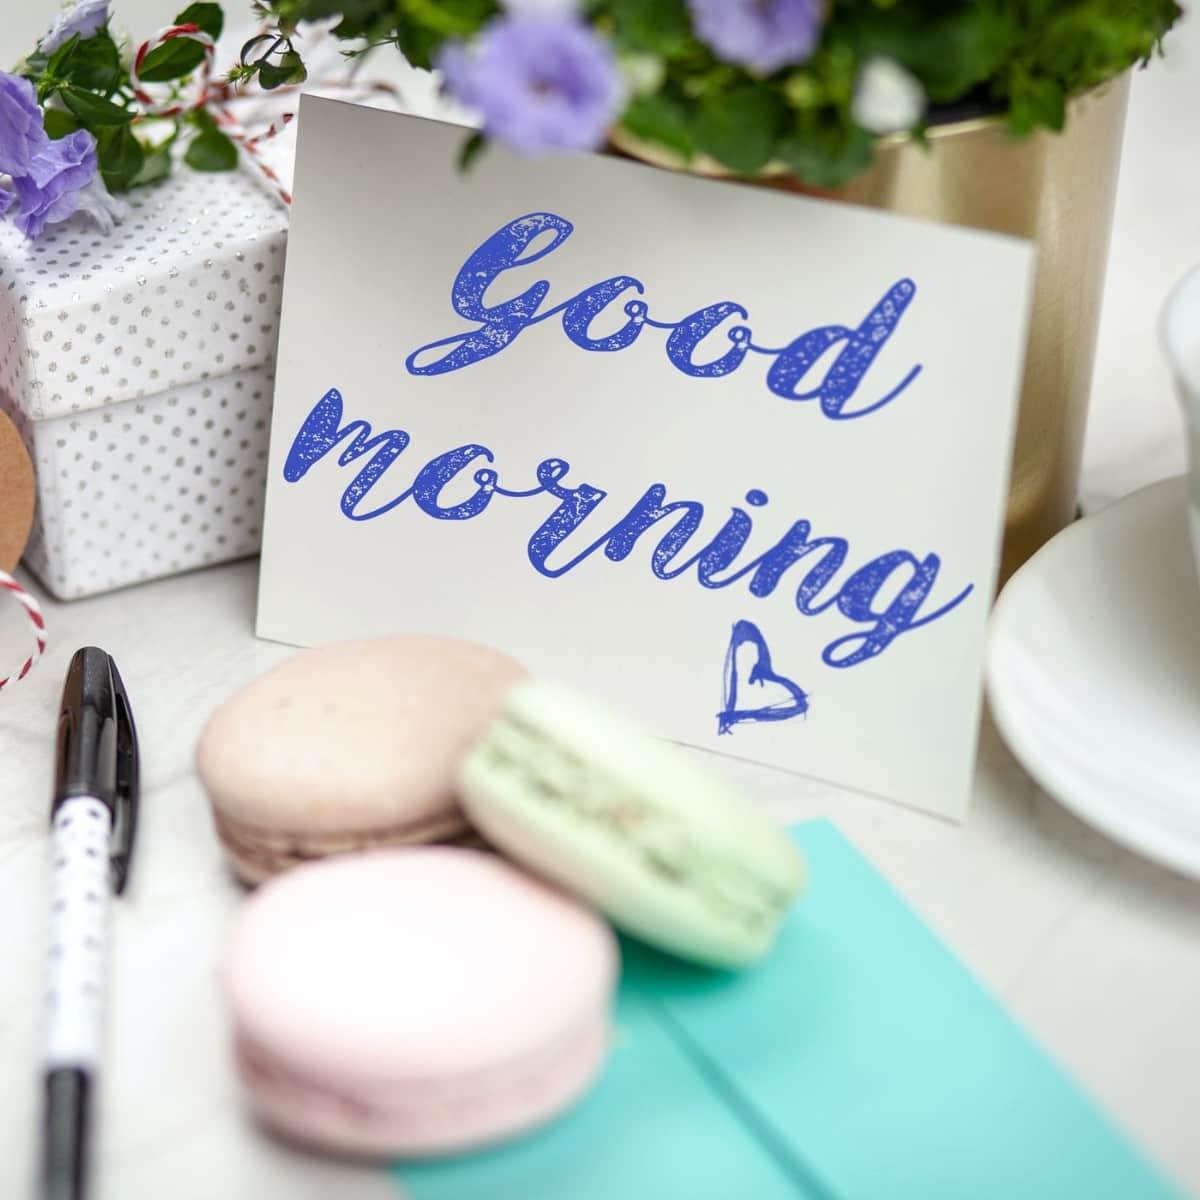 7 Uplifting Monday Morning Prayers to Kick Off Your Week